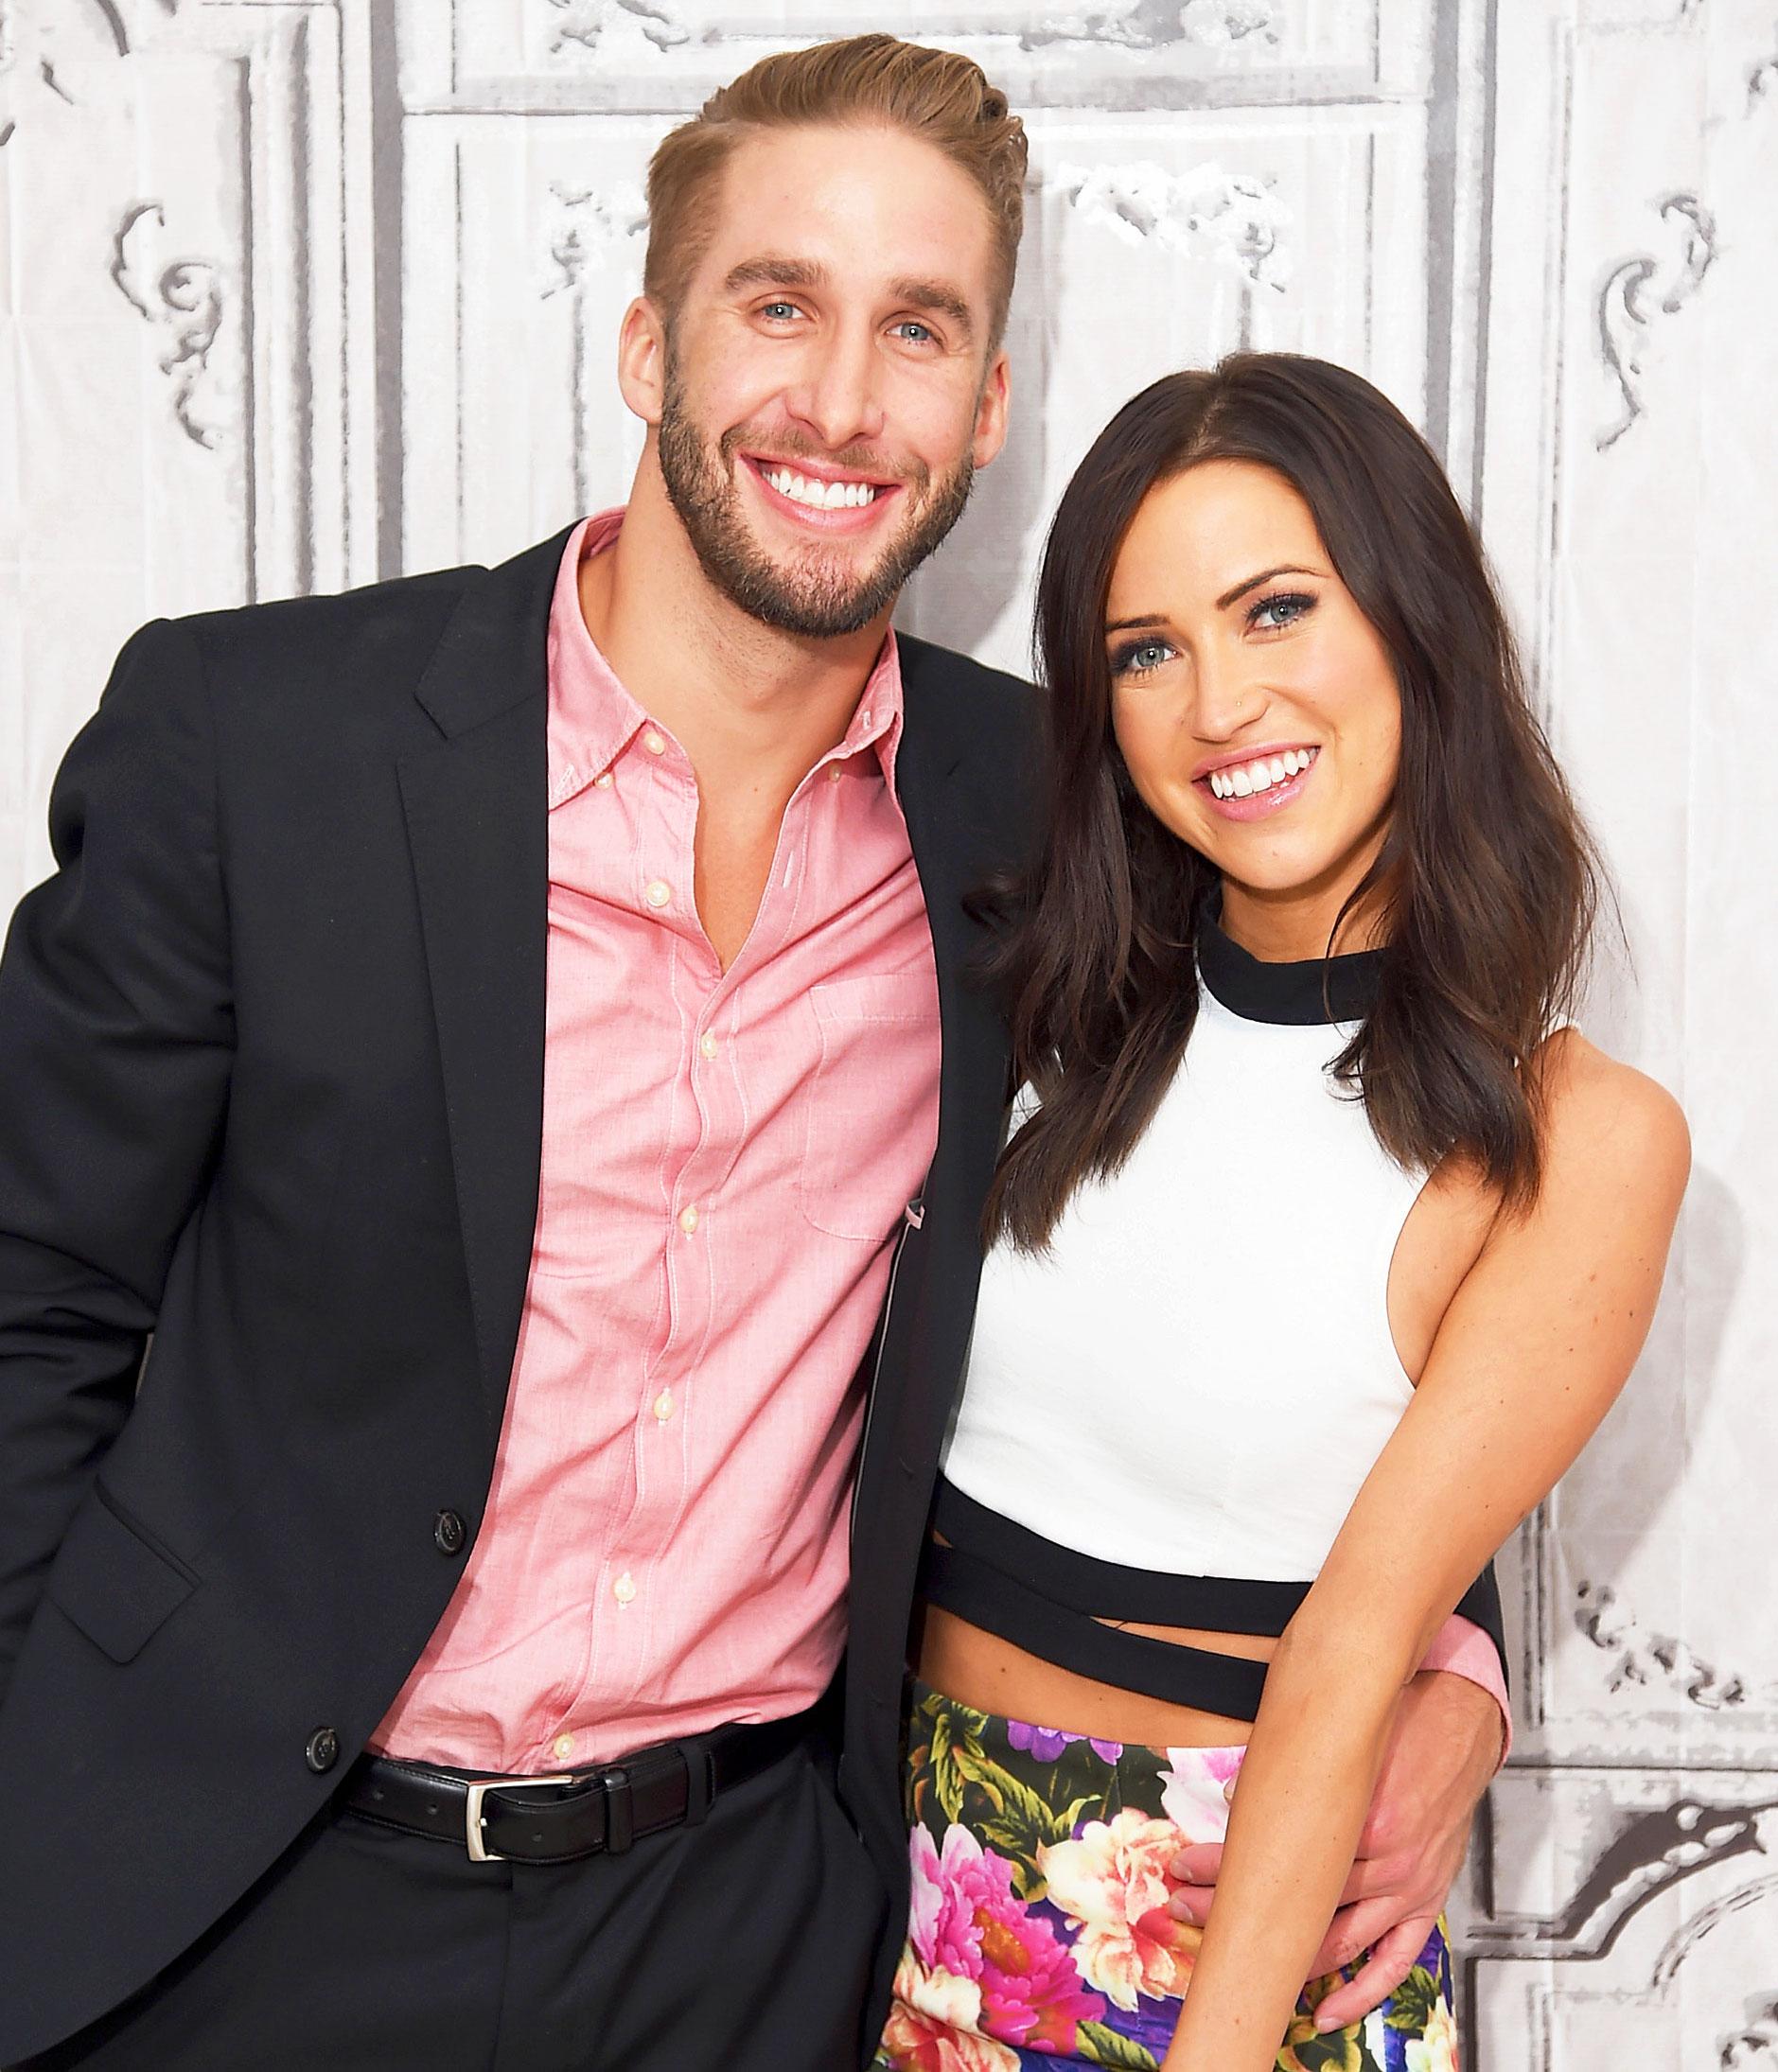 ABC Wants to Do a \'Mass Bachelor Wedding\'